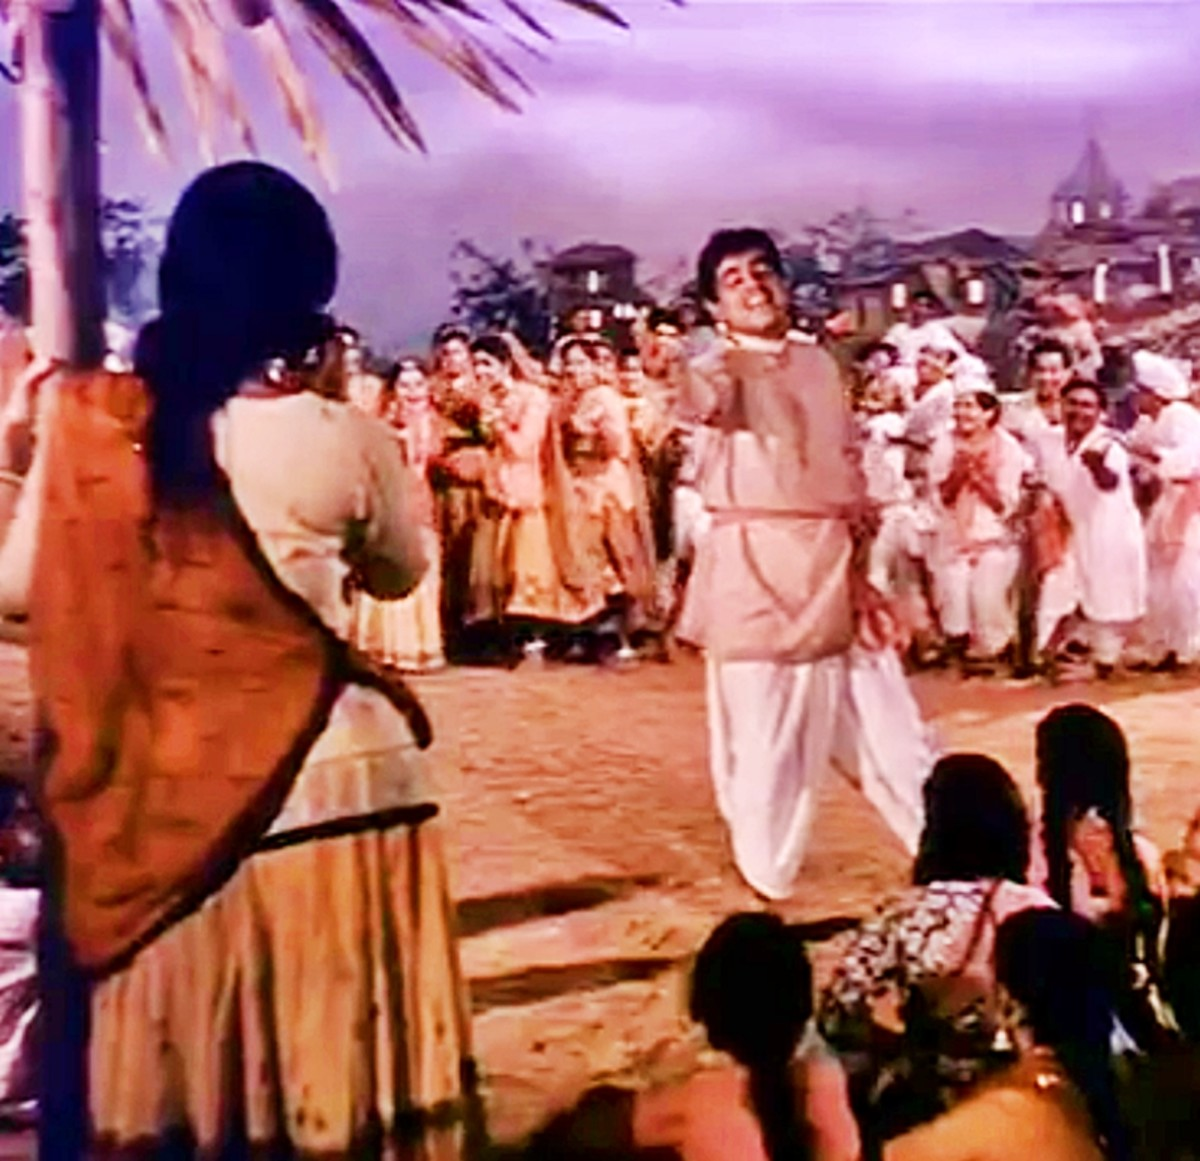 Dilip Kumar and Vaijayanthimala in Ganga Jamuna.  A beautiful folk dance celebrating love with joy.